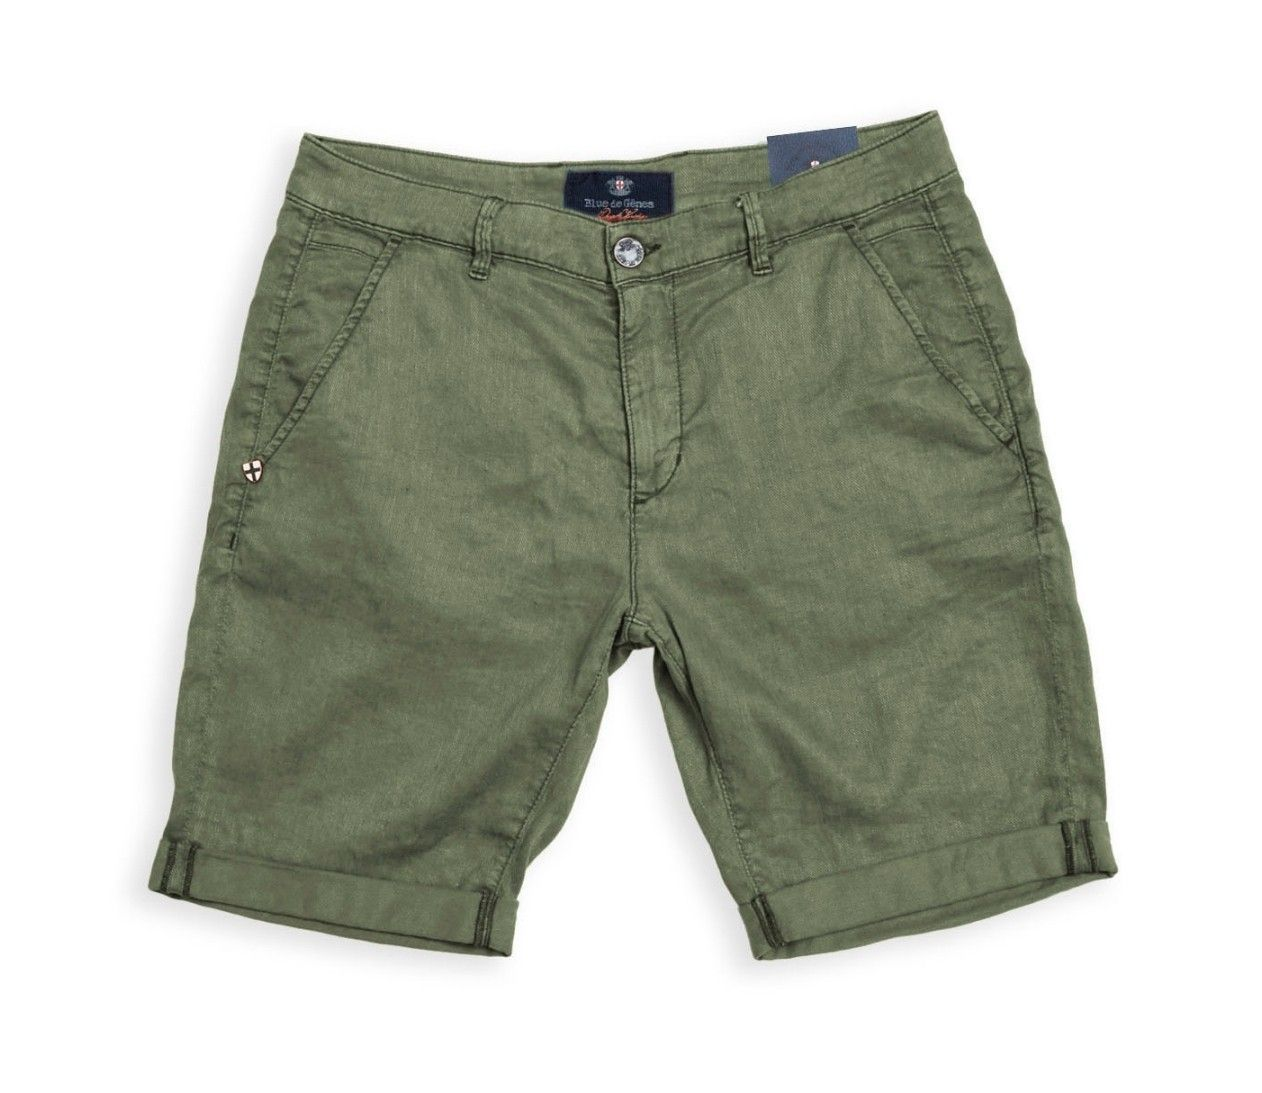 BLUE DE GÊNES - Herren Shorts - Teo Shane Shorts - Herb Green